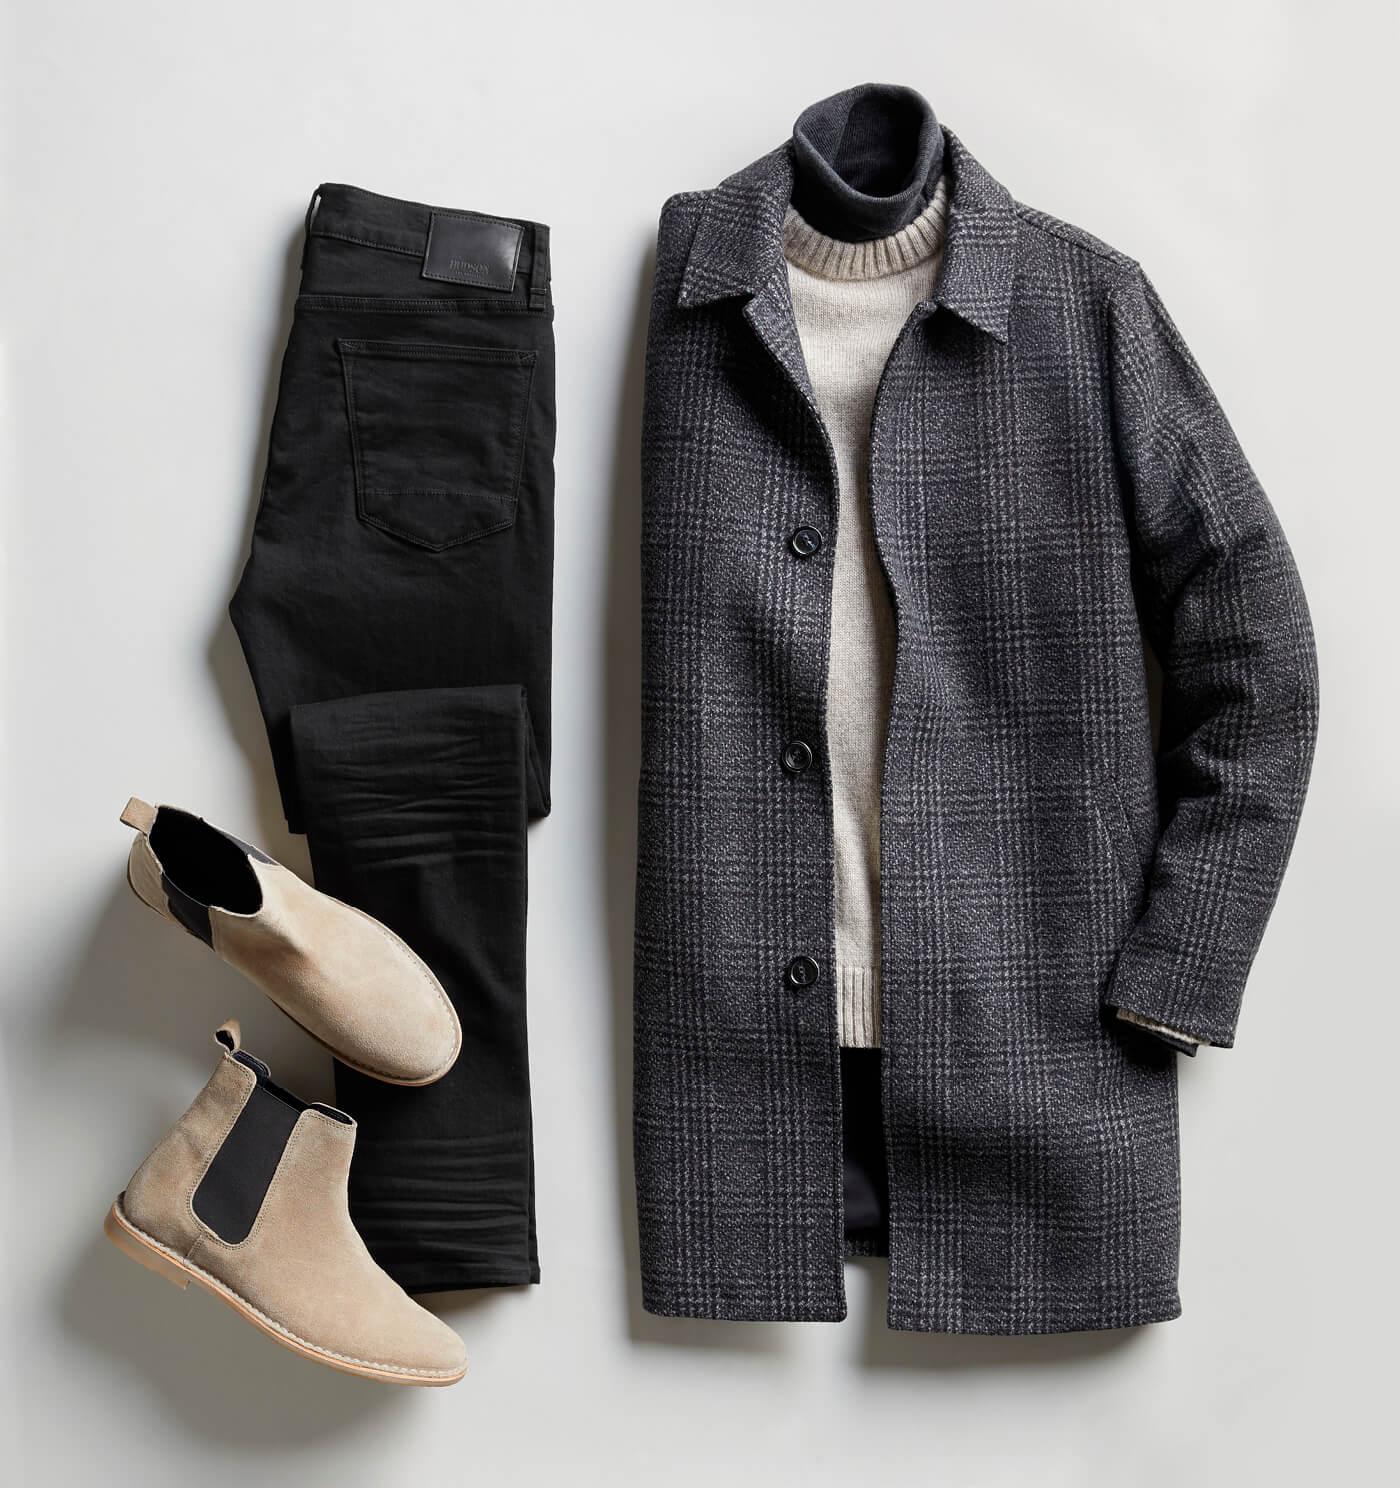 black coat and black pants